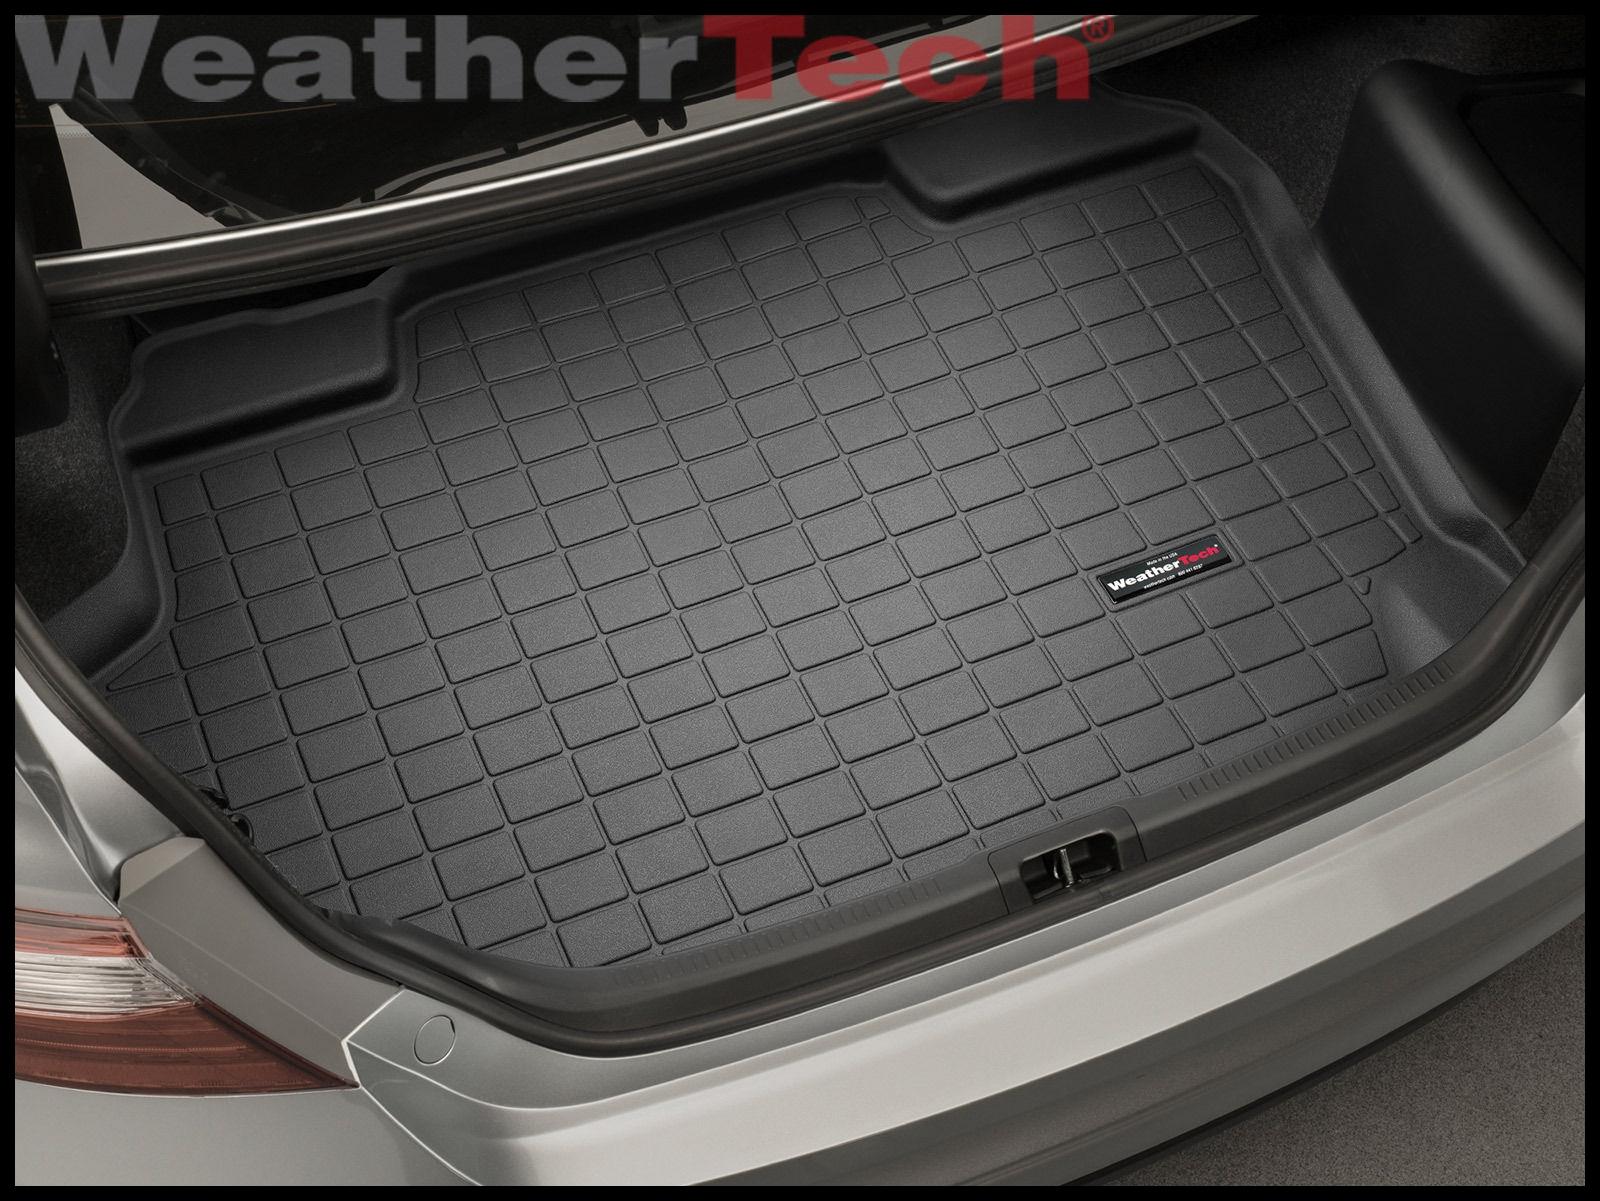 WeatherTech Cargo Liner Trunk Mat for Toyota Camry Hybrid 2012 2017 Black